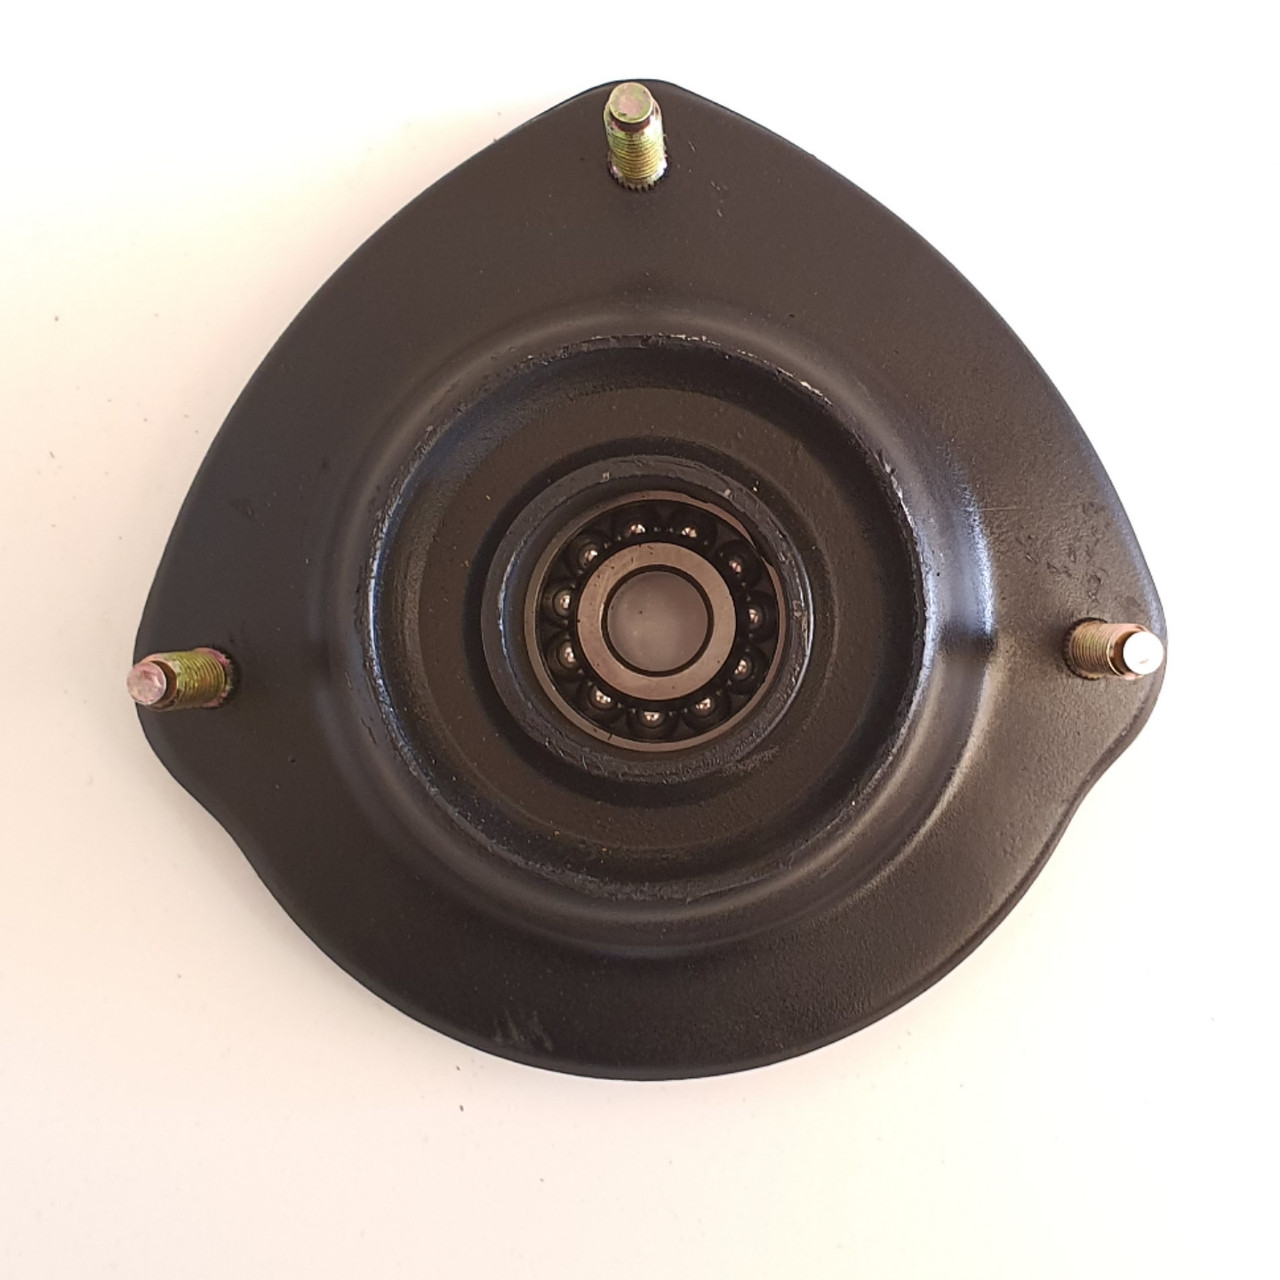 Опора амортизатора Daewoo Lanos 97-02 96225638 (пр-во PHG корея ОЕ)